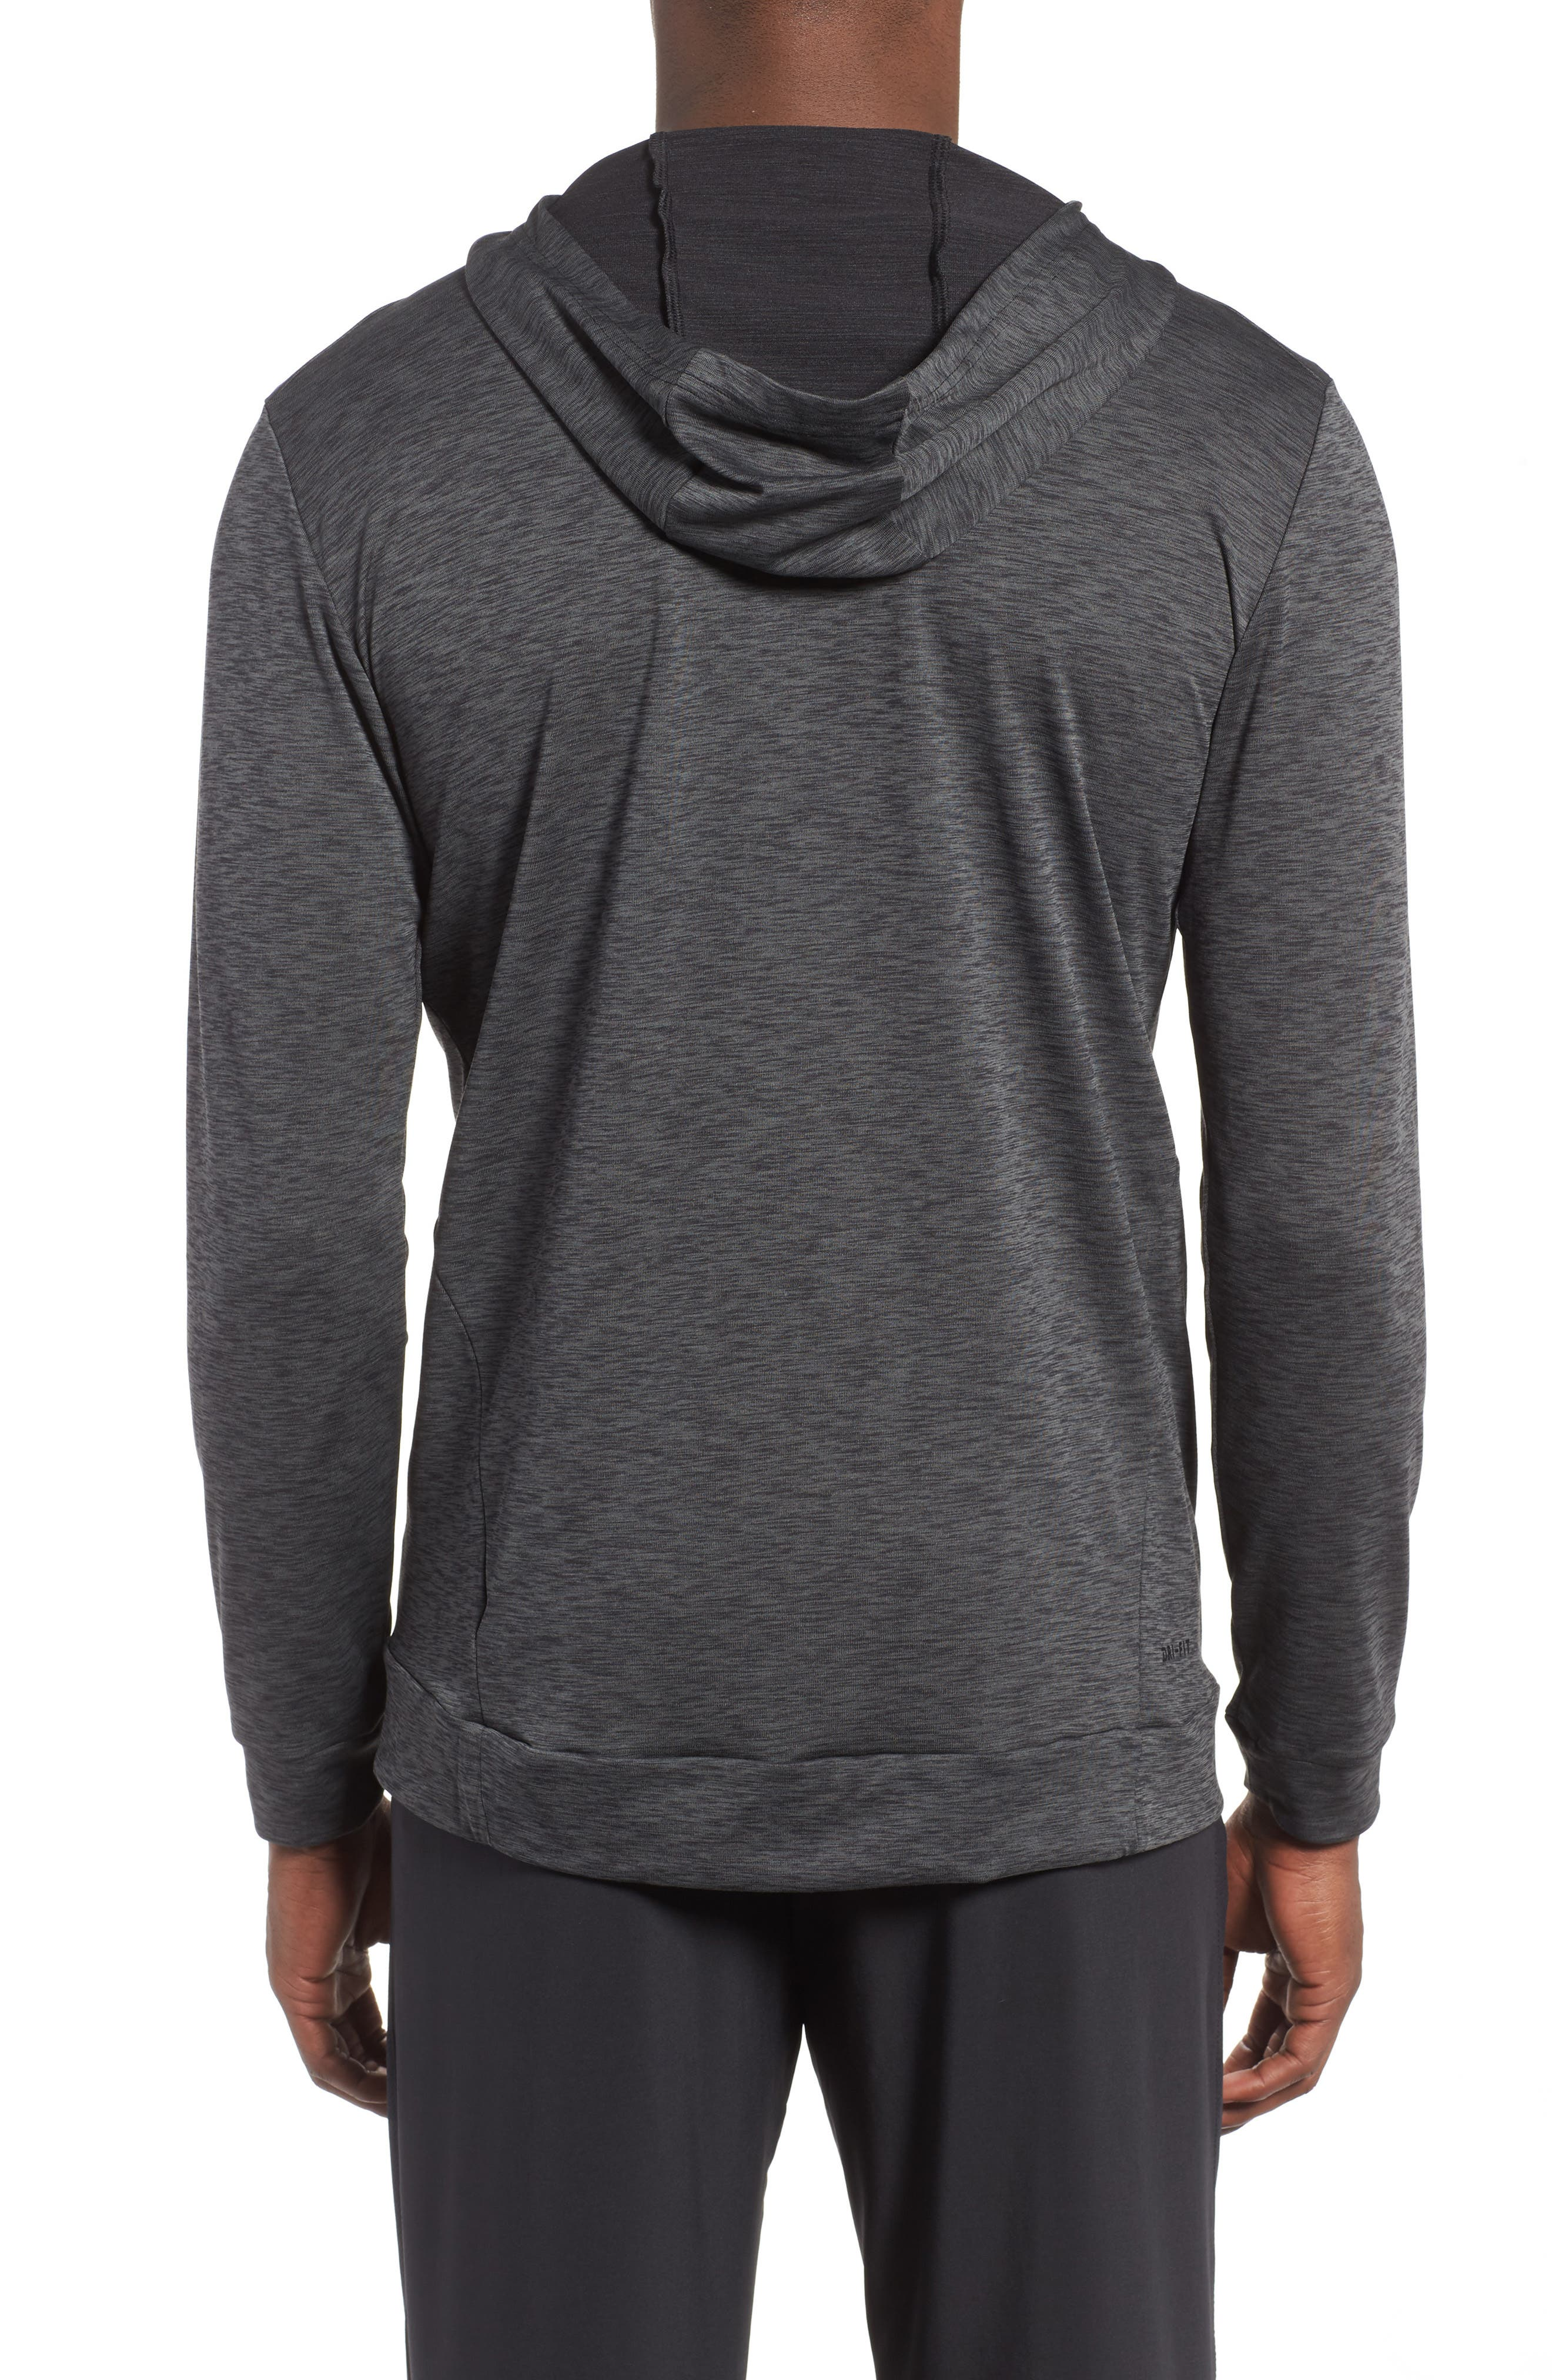 Hyper Dry Regular Fit Training Hoodie,                             Alternate thumbnail 2, color,                             ANTHRACITE/BLACK/BLACK